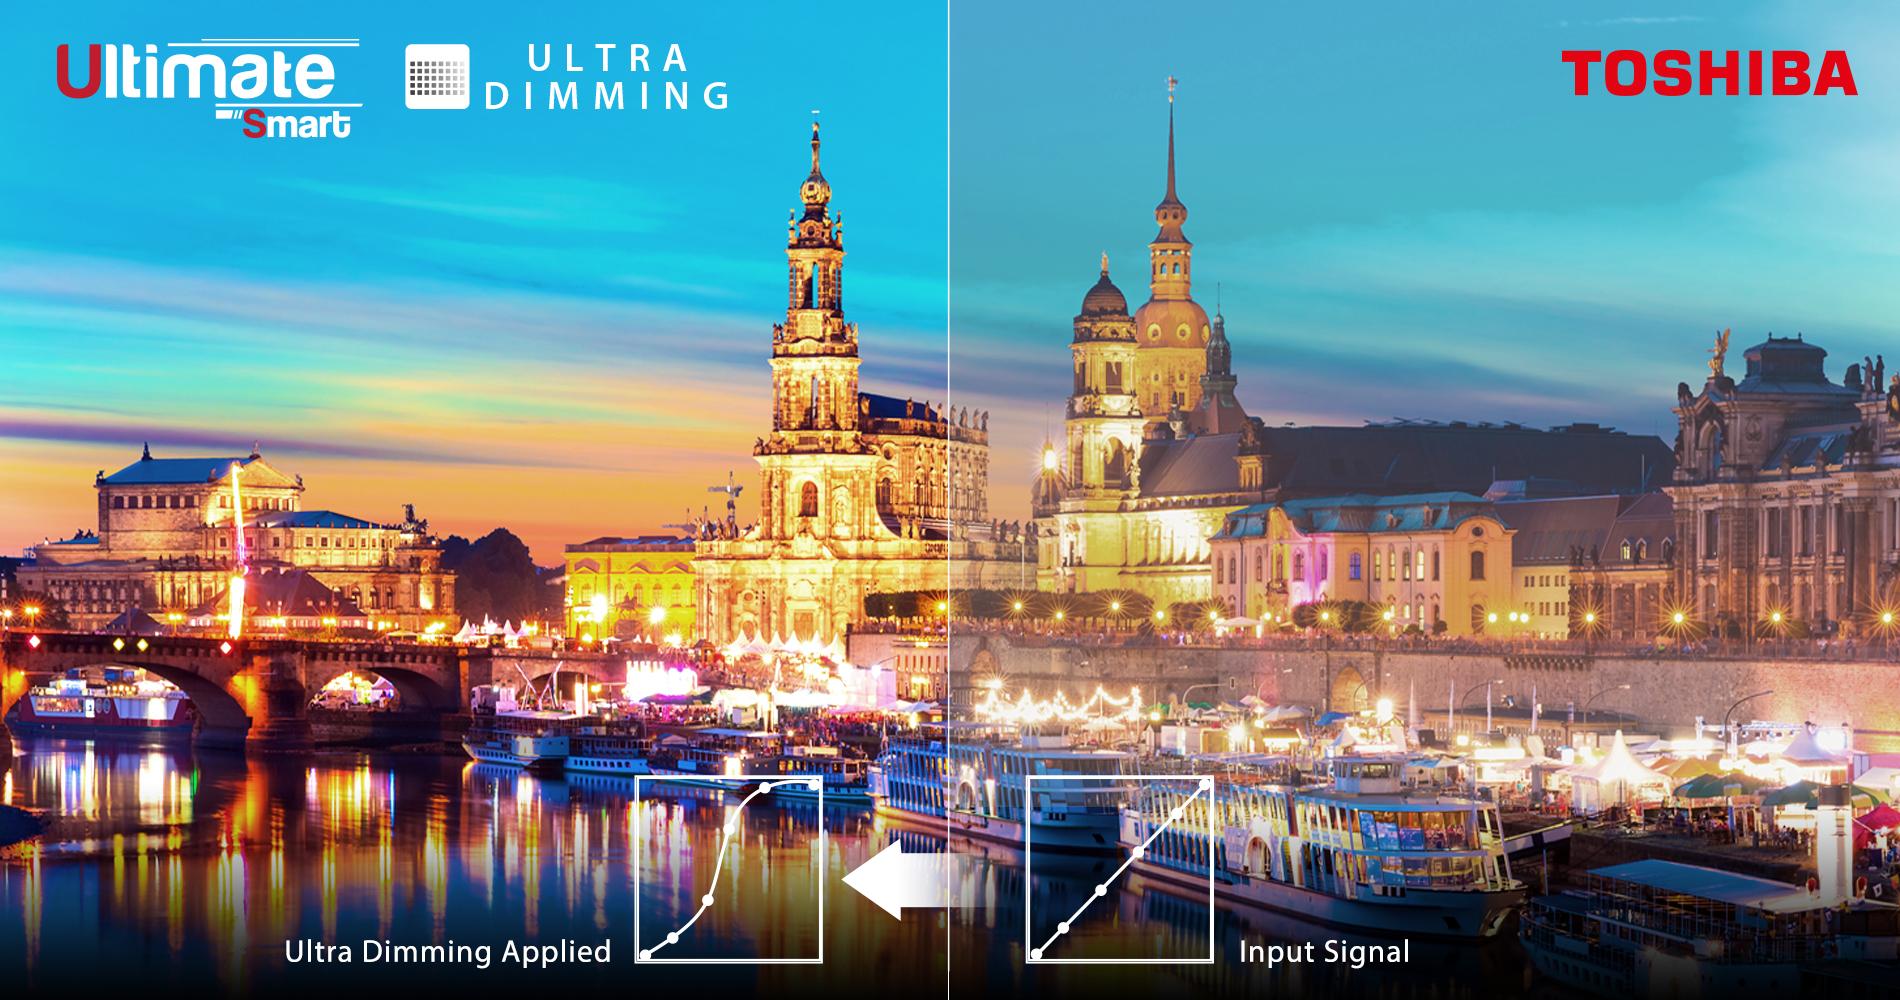 Toshiba 4K Smarter TV Ultra Dimming Technology